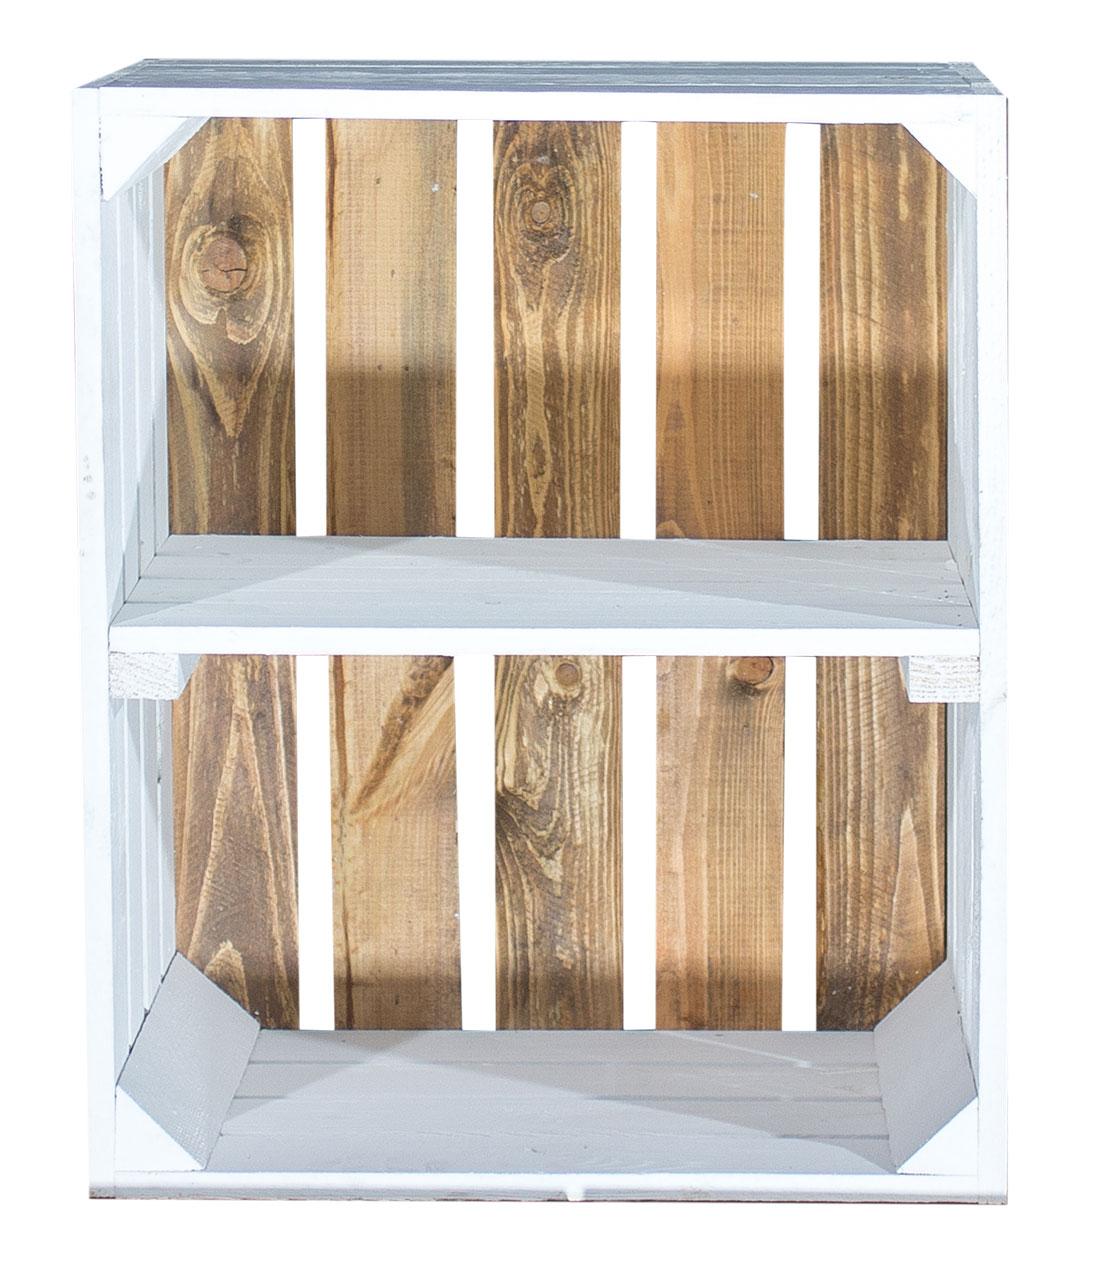 Full Size of Regal Kisten System Aus Holzkisten Selber Bauen Ikea Basteln Holz Kaufen Regale Bauanleitung Farbige Weies Apfelkiste Weier Boden 50x40x30cm Rausfallschutz Regal Regal Aus Kisten